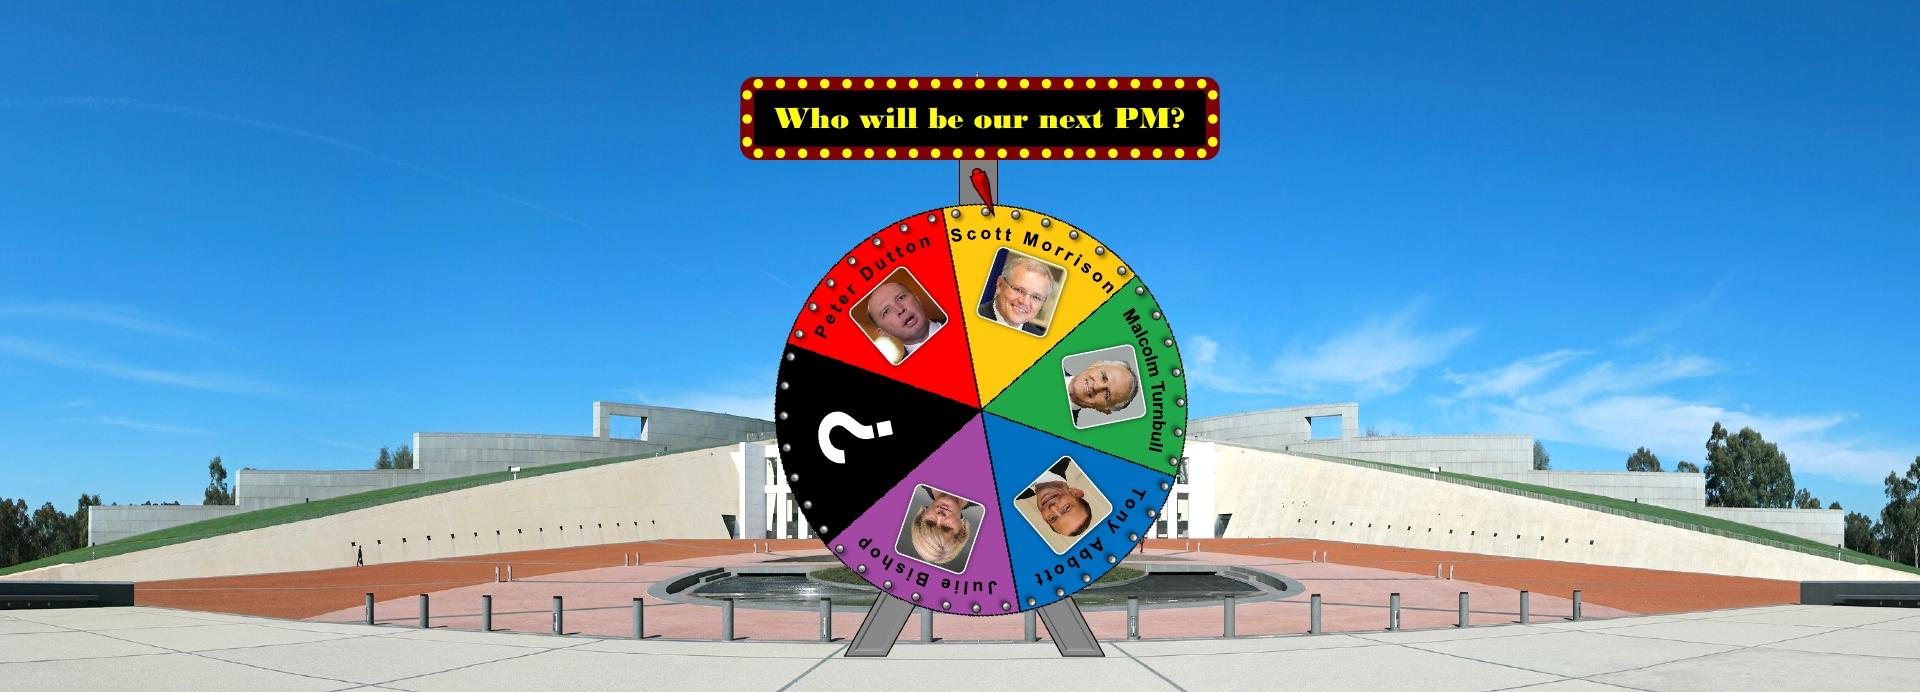 PDFtoJPG.me-1 (5)